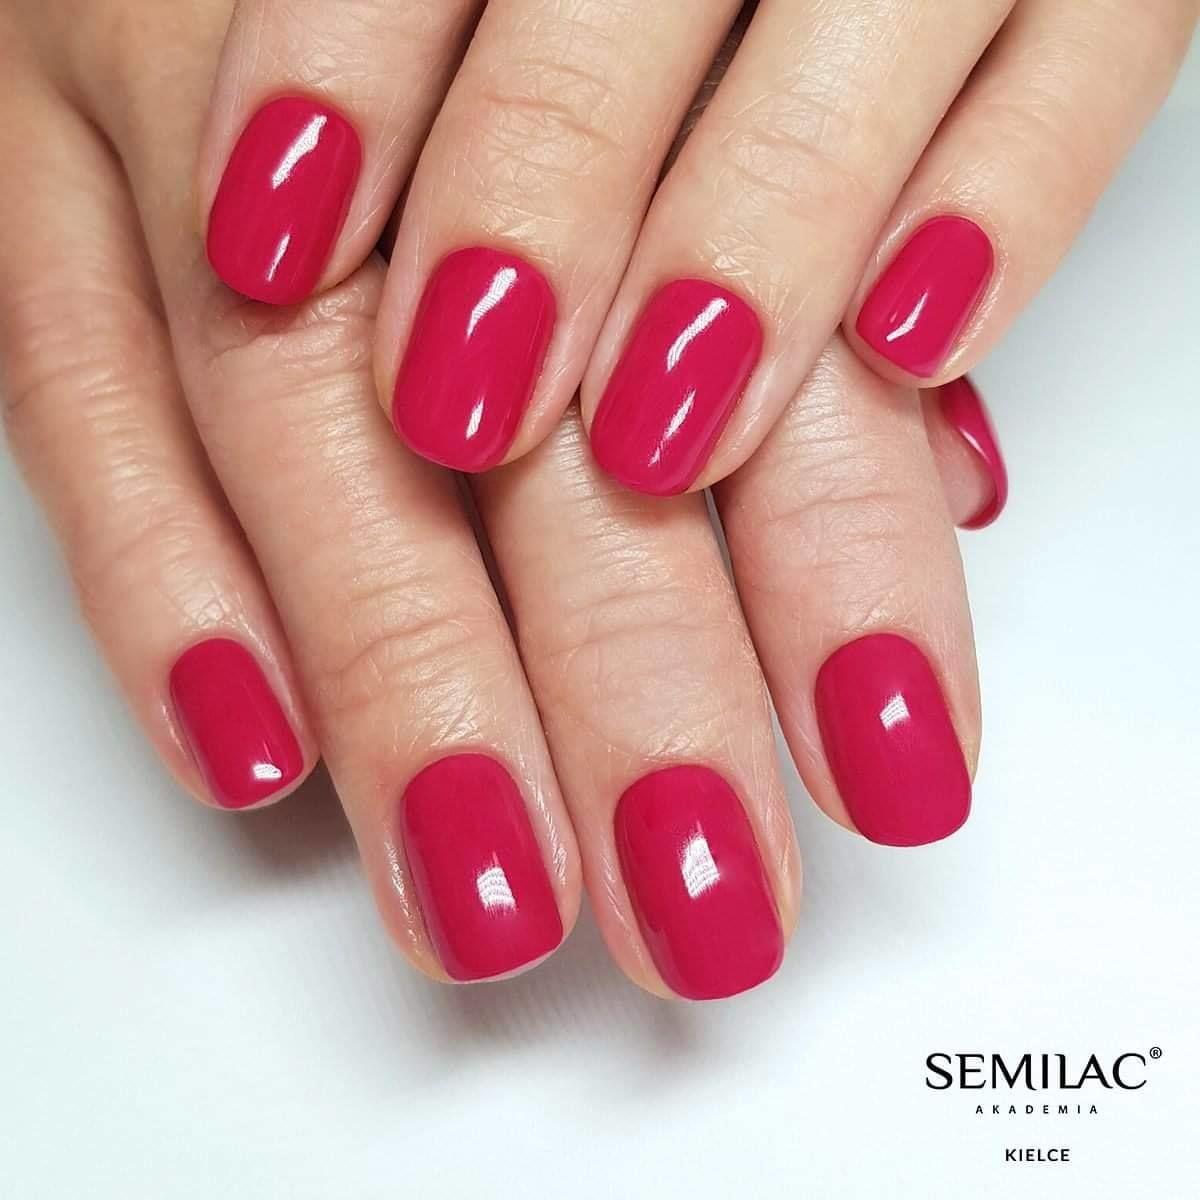 SEMILAC 066 Glossy Cranberry UV LED Lakier Hybrydowy 7ml